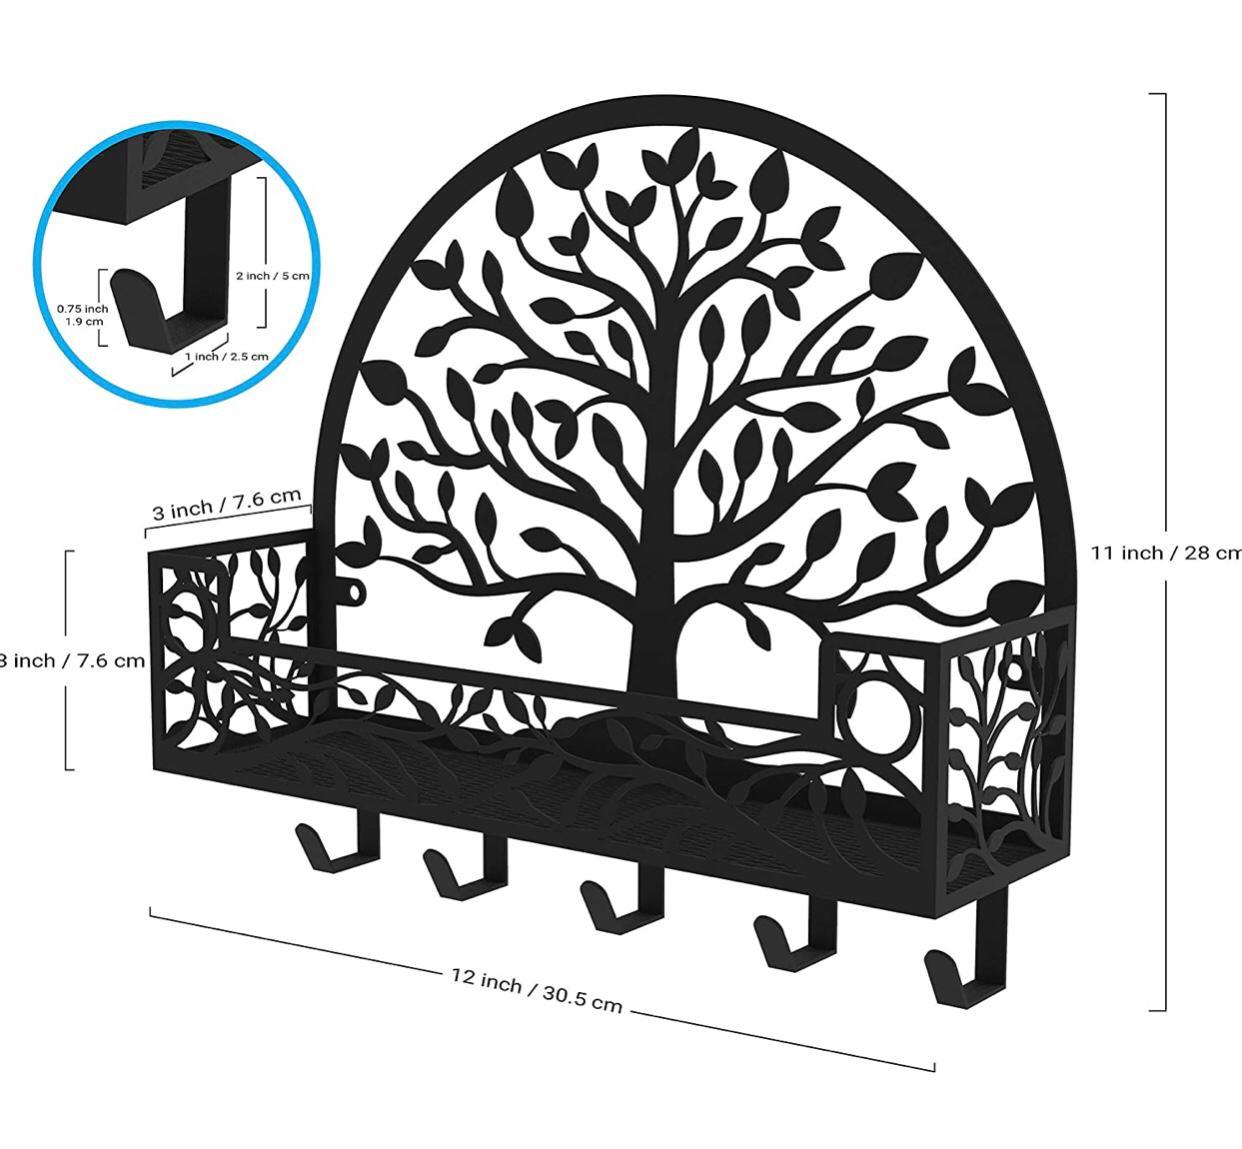 You Bella LLC الجملة شجرة تصميم نمط شماعات معدنية الزخرفية للمنازل ، سلسلة المفاتيح ، حامل حقيبة ، الحائط الأسود